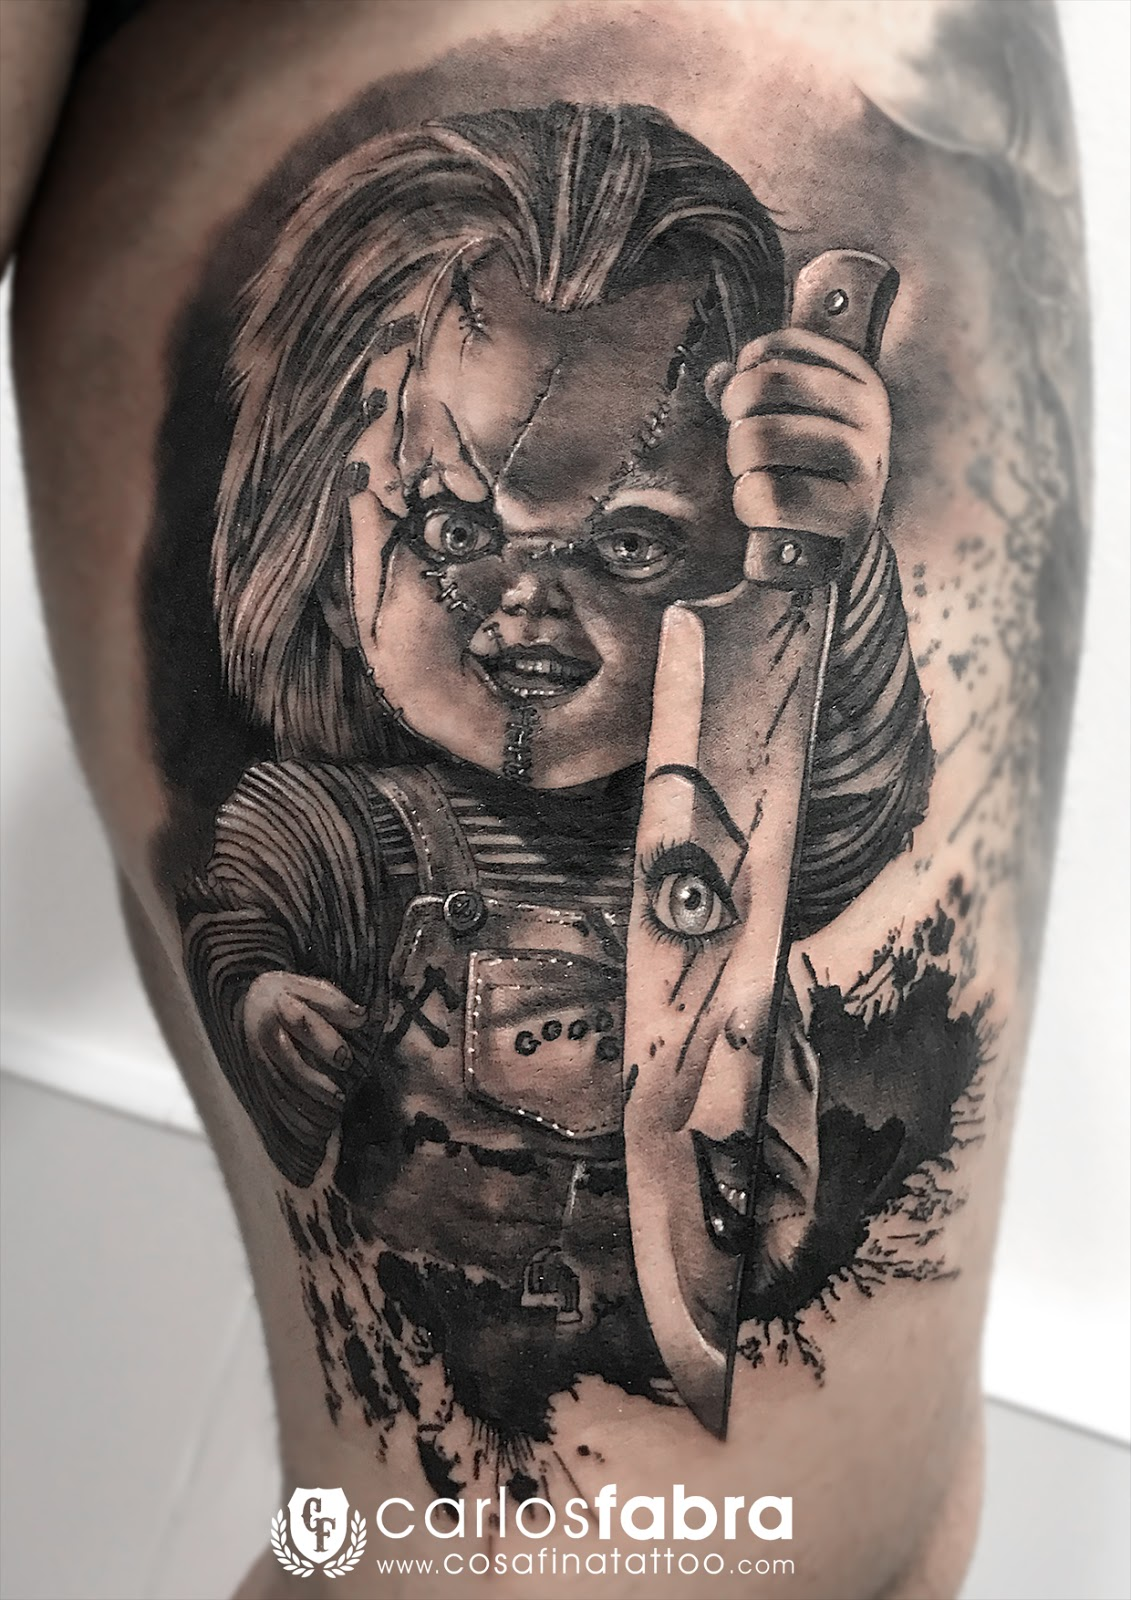 Cosafina Tattoo Carlos Art Studio Tatuaje Chucky Muñeco Diabolico